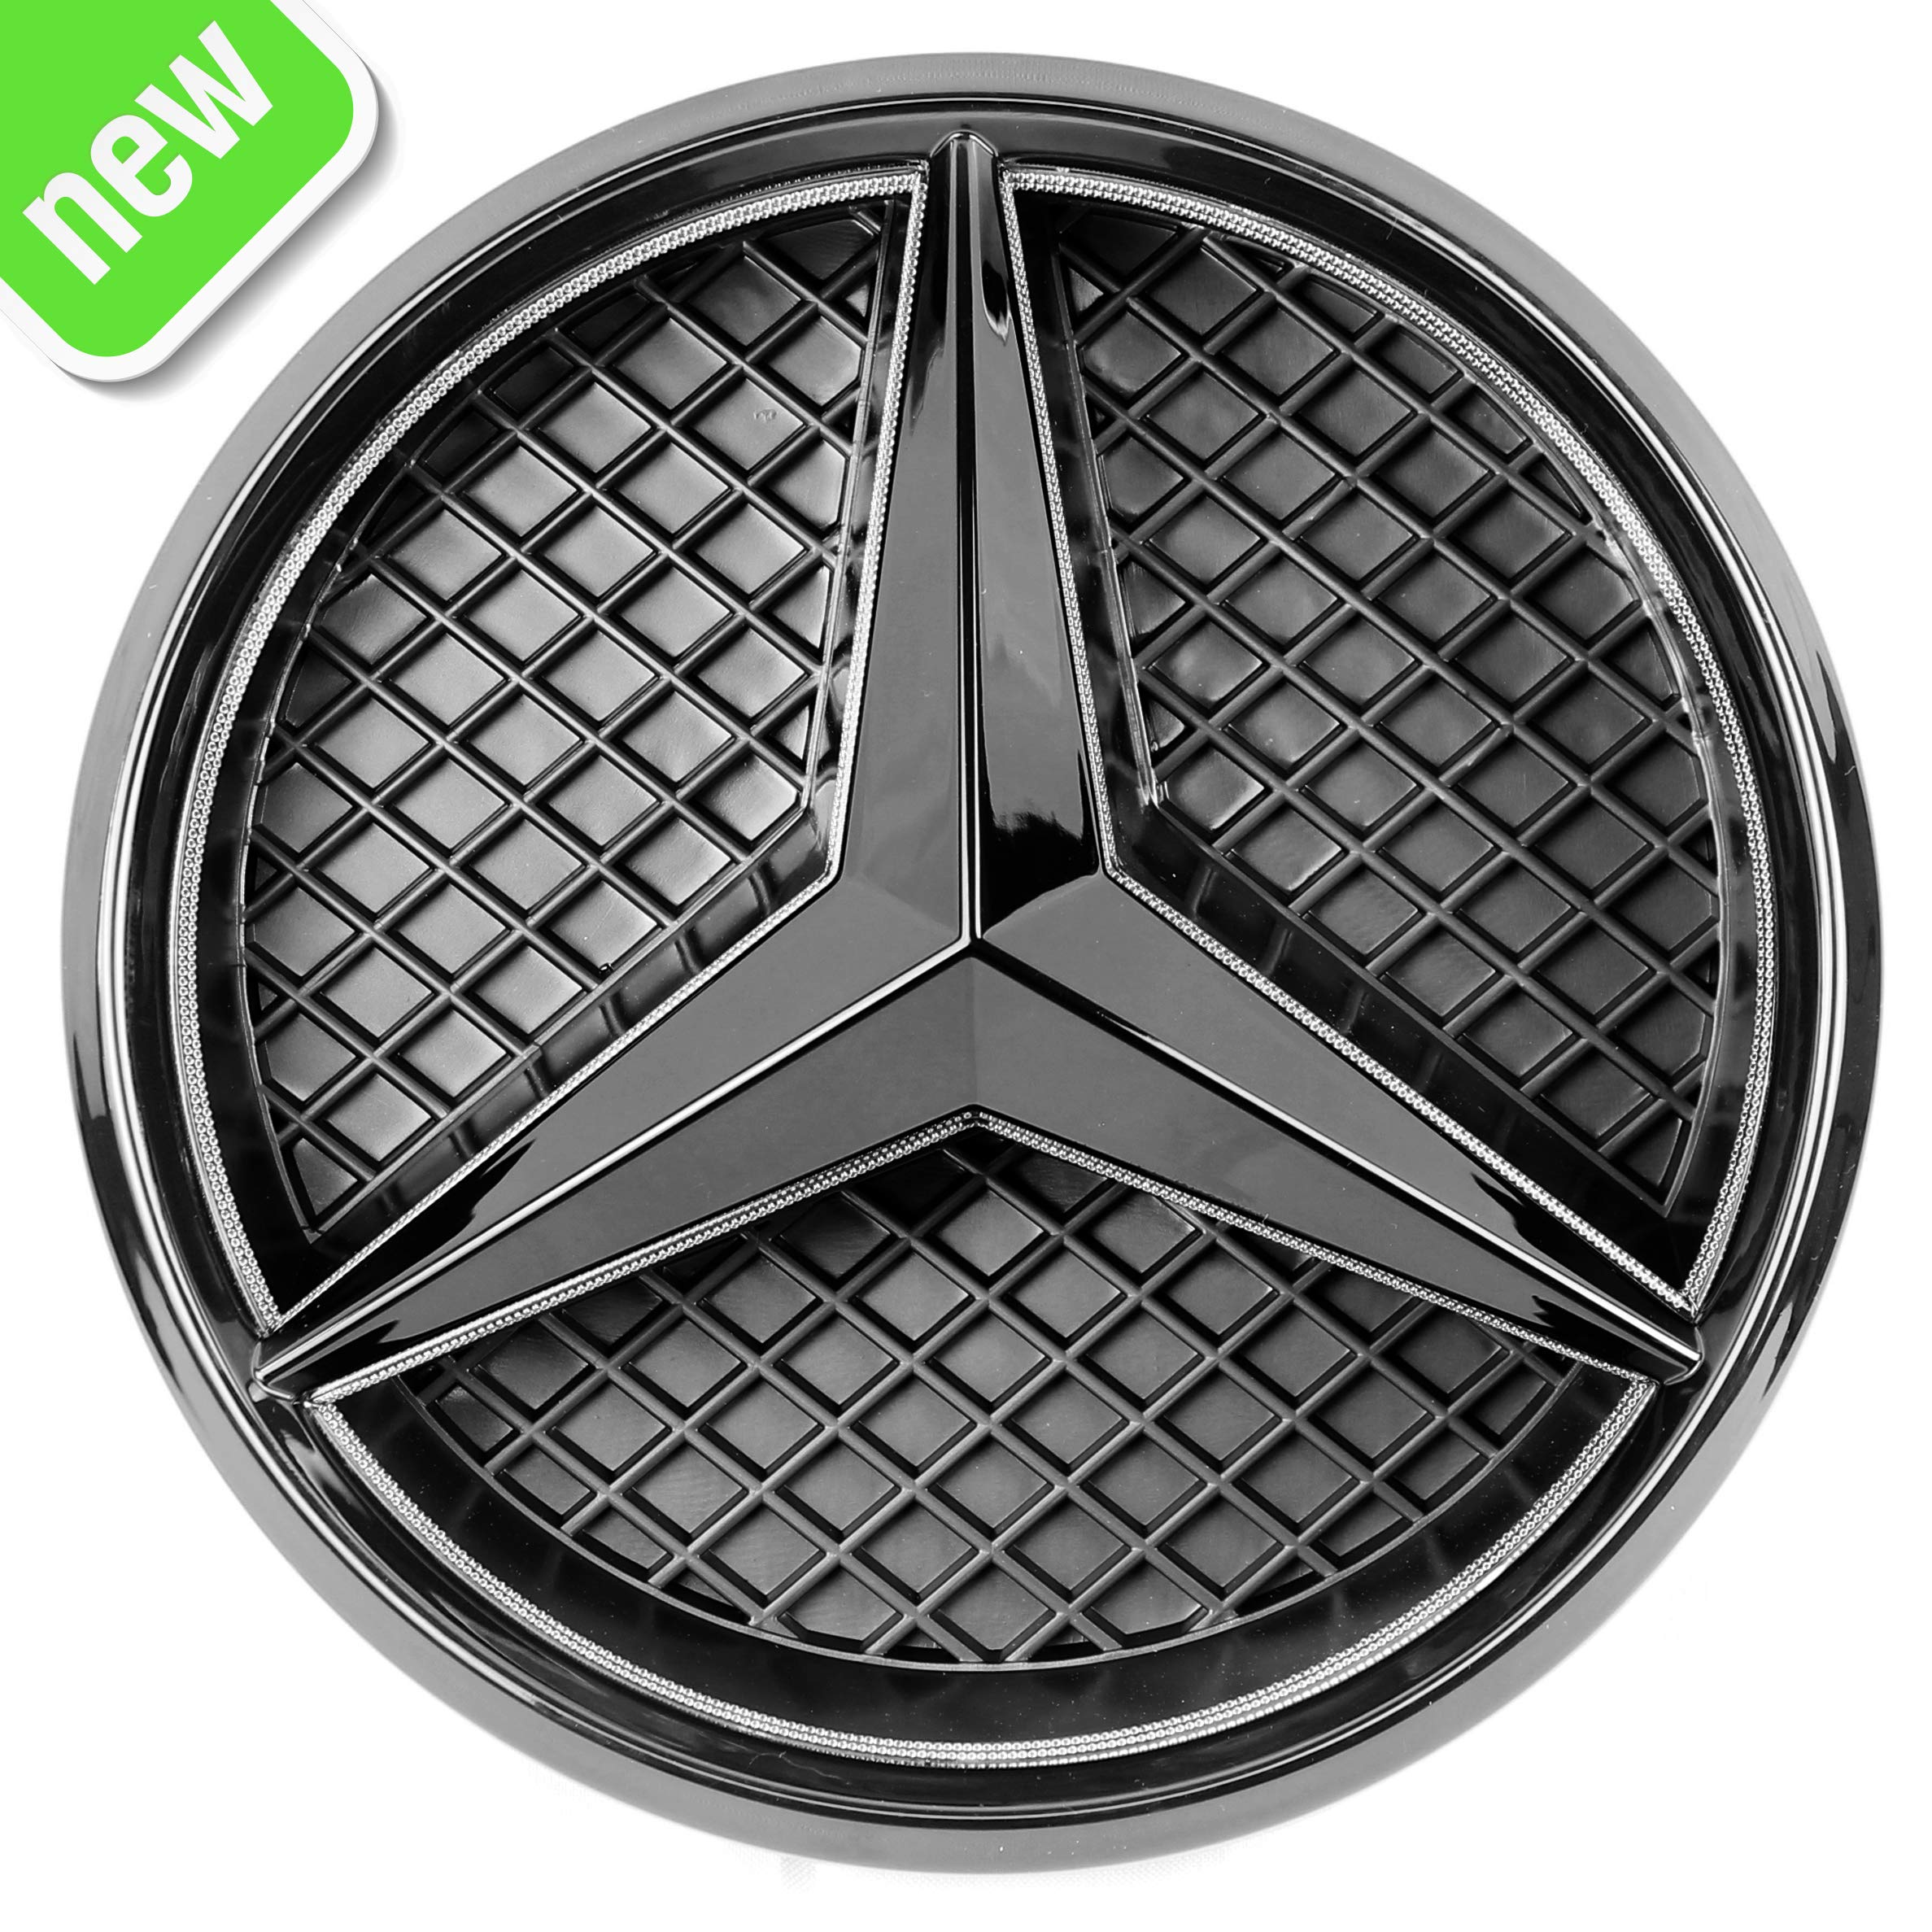 JetStyle LED Emblem for Mercedes Benz 2011-2018 Black Edition, Front Car Grille Badge, Illuminated Logo Hood Star DRL, White Light - Drive Brighter